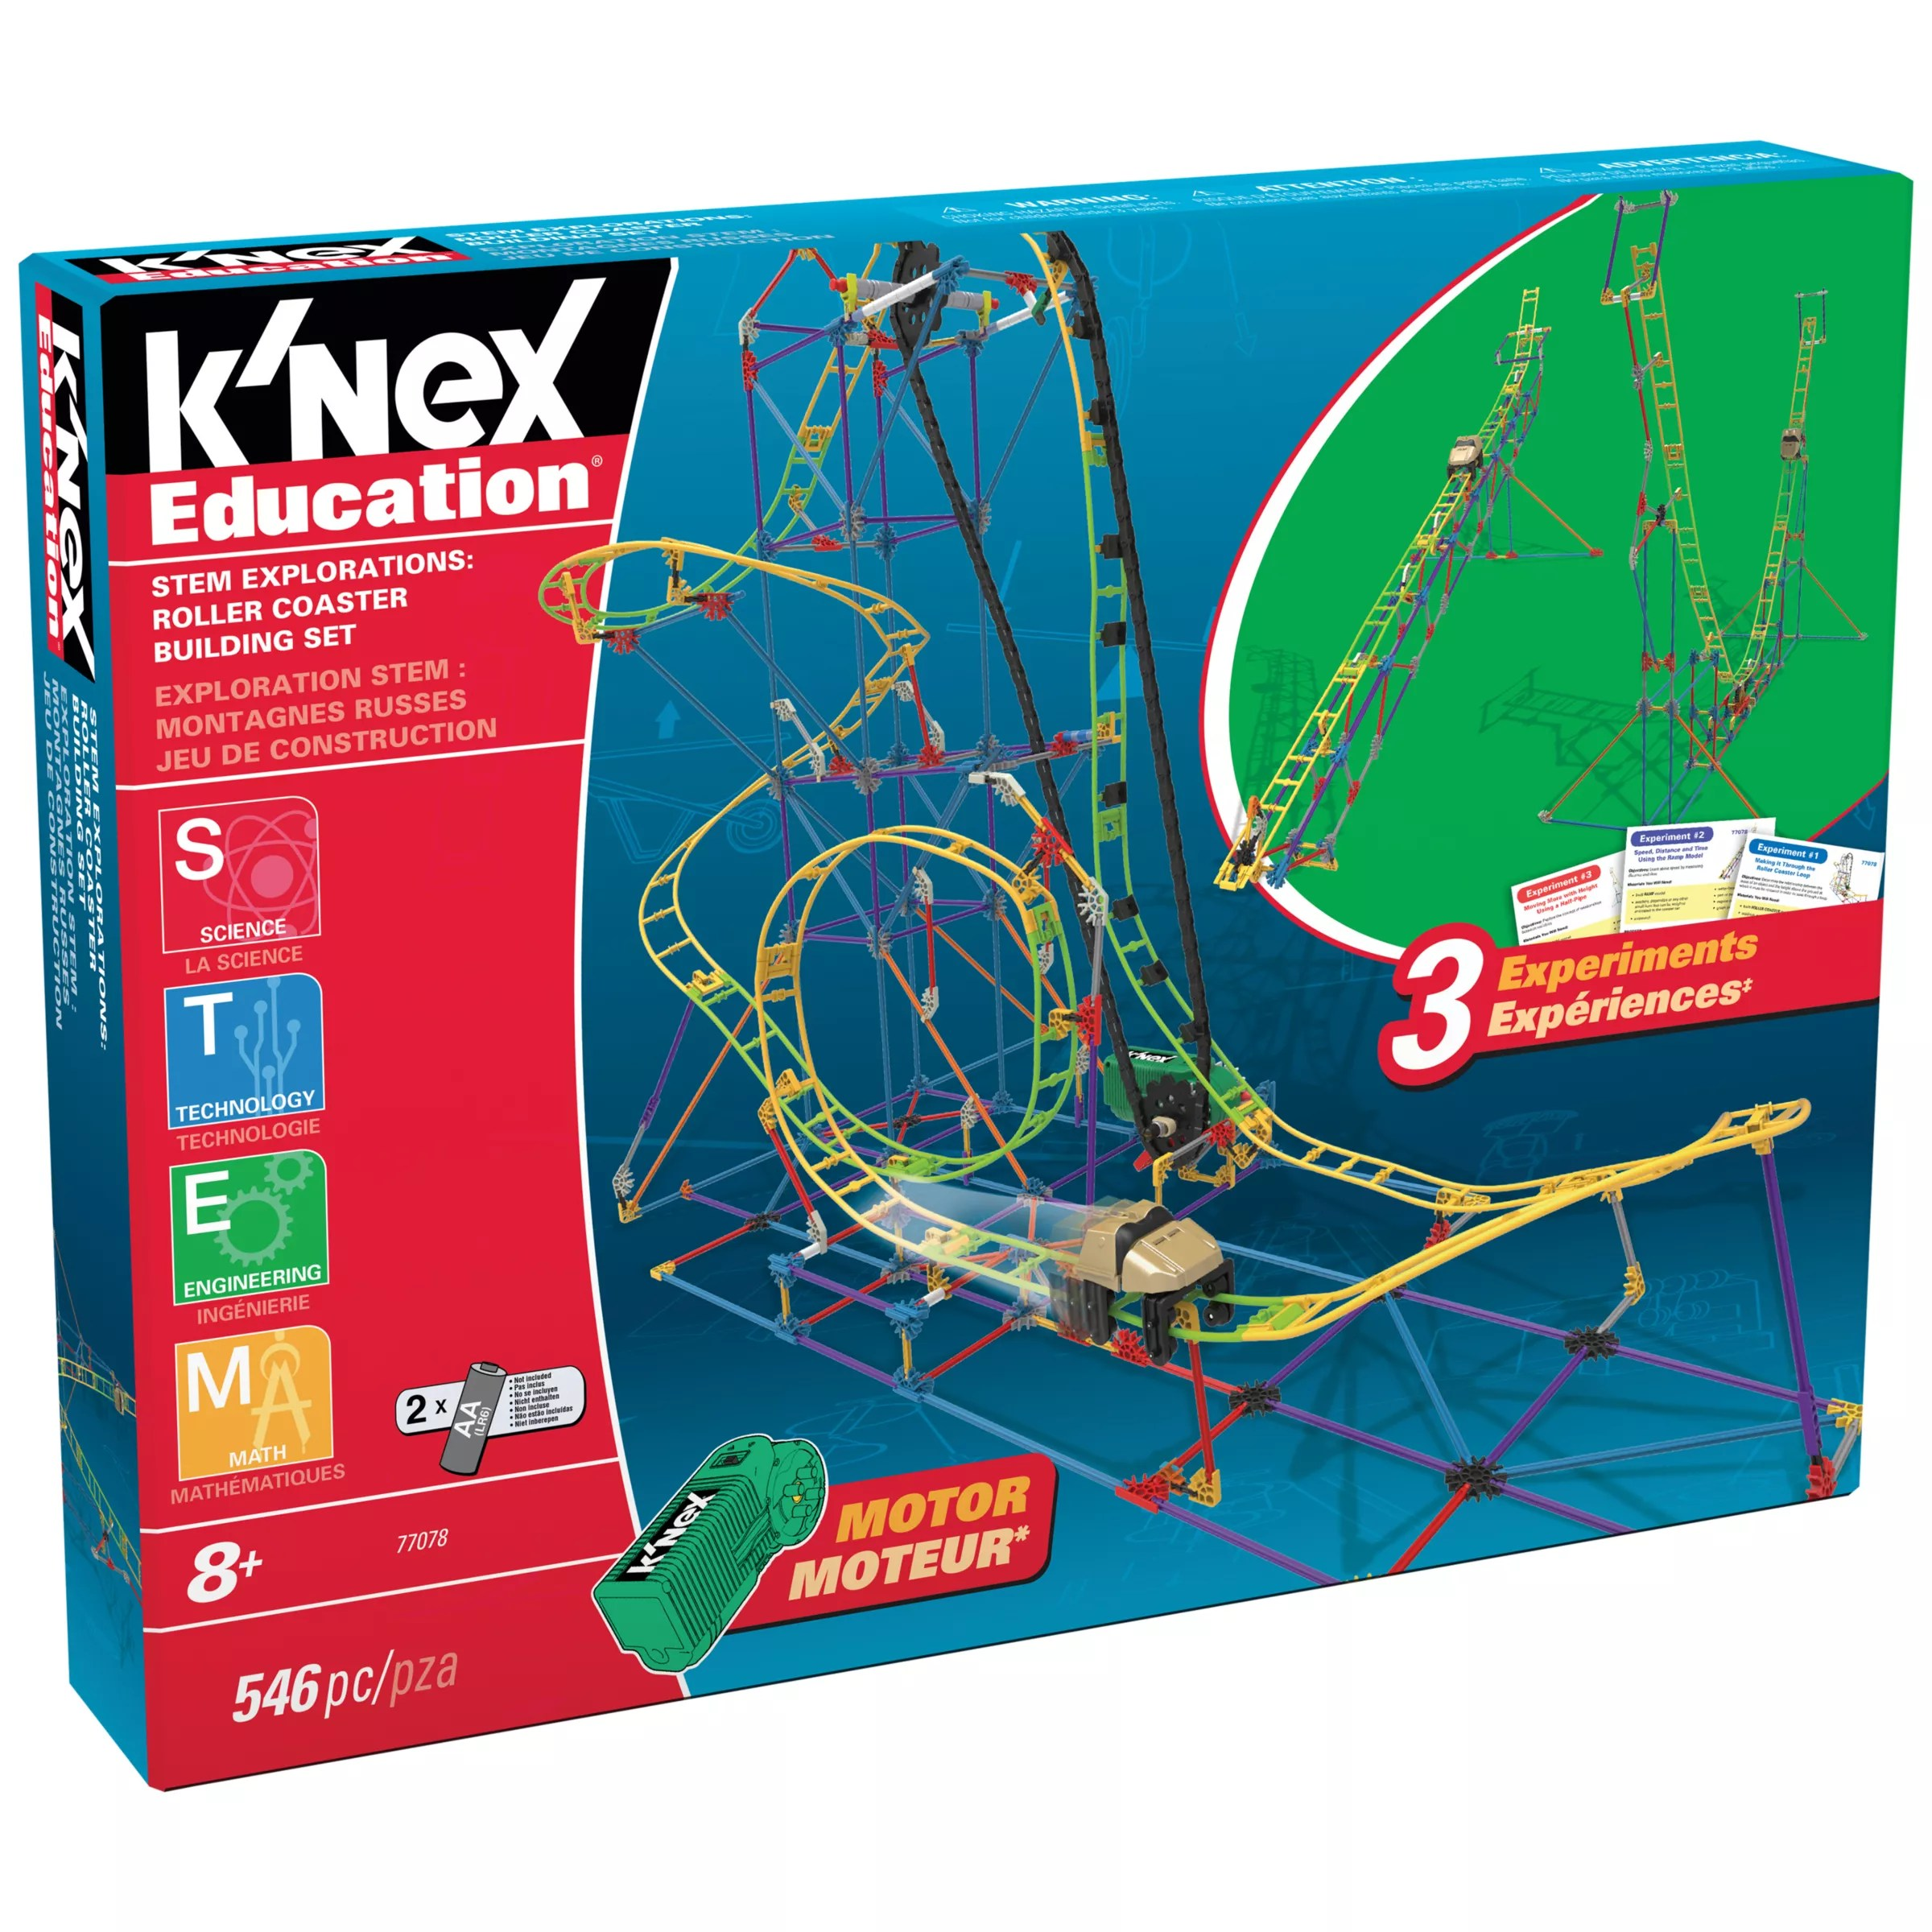 'nex Education Stem Explorations Roller Coaster Building